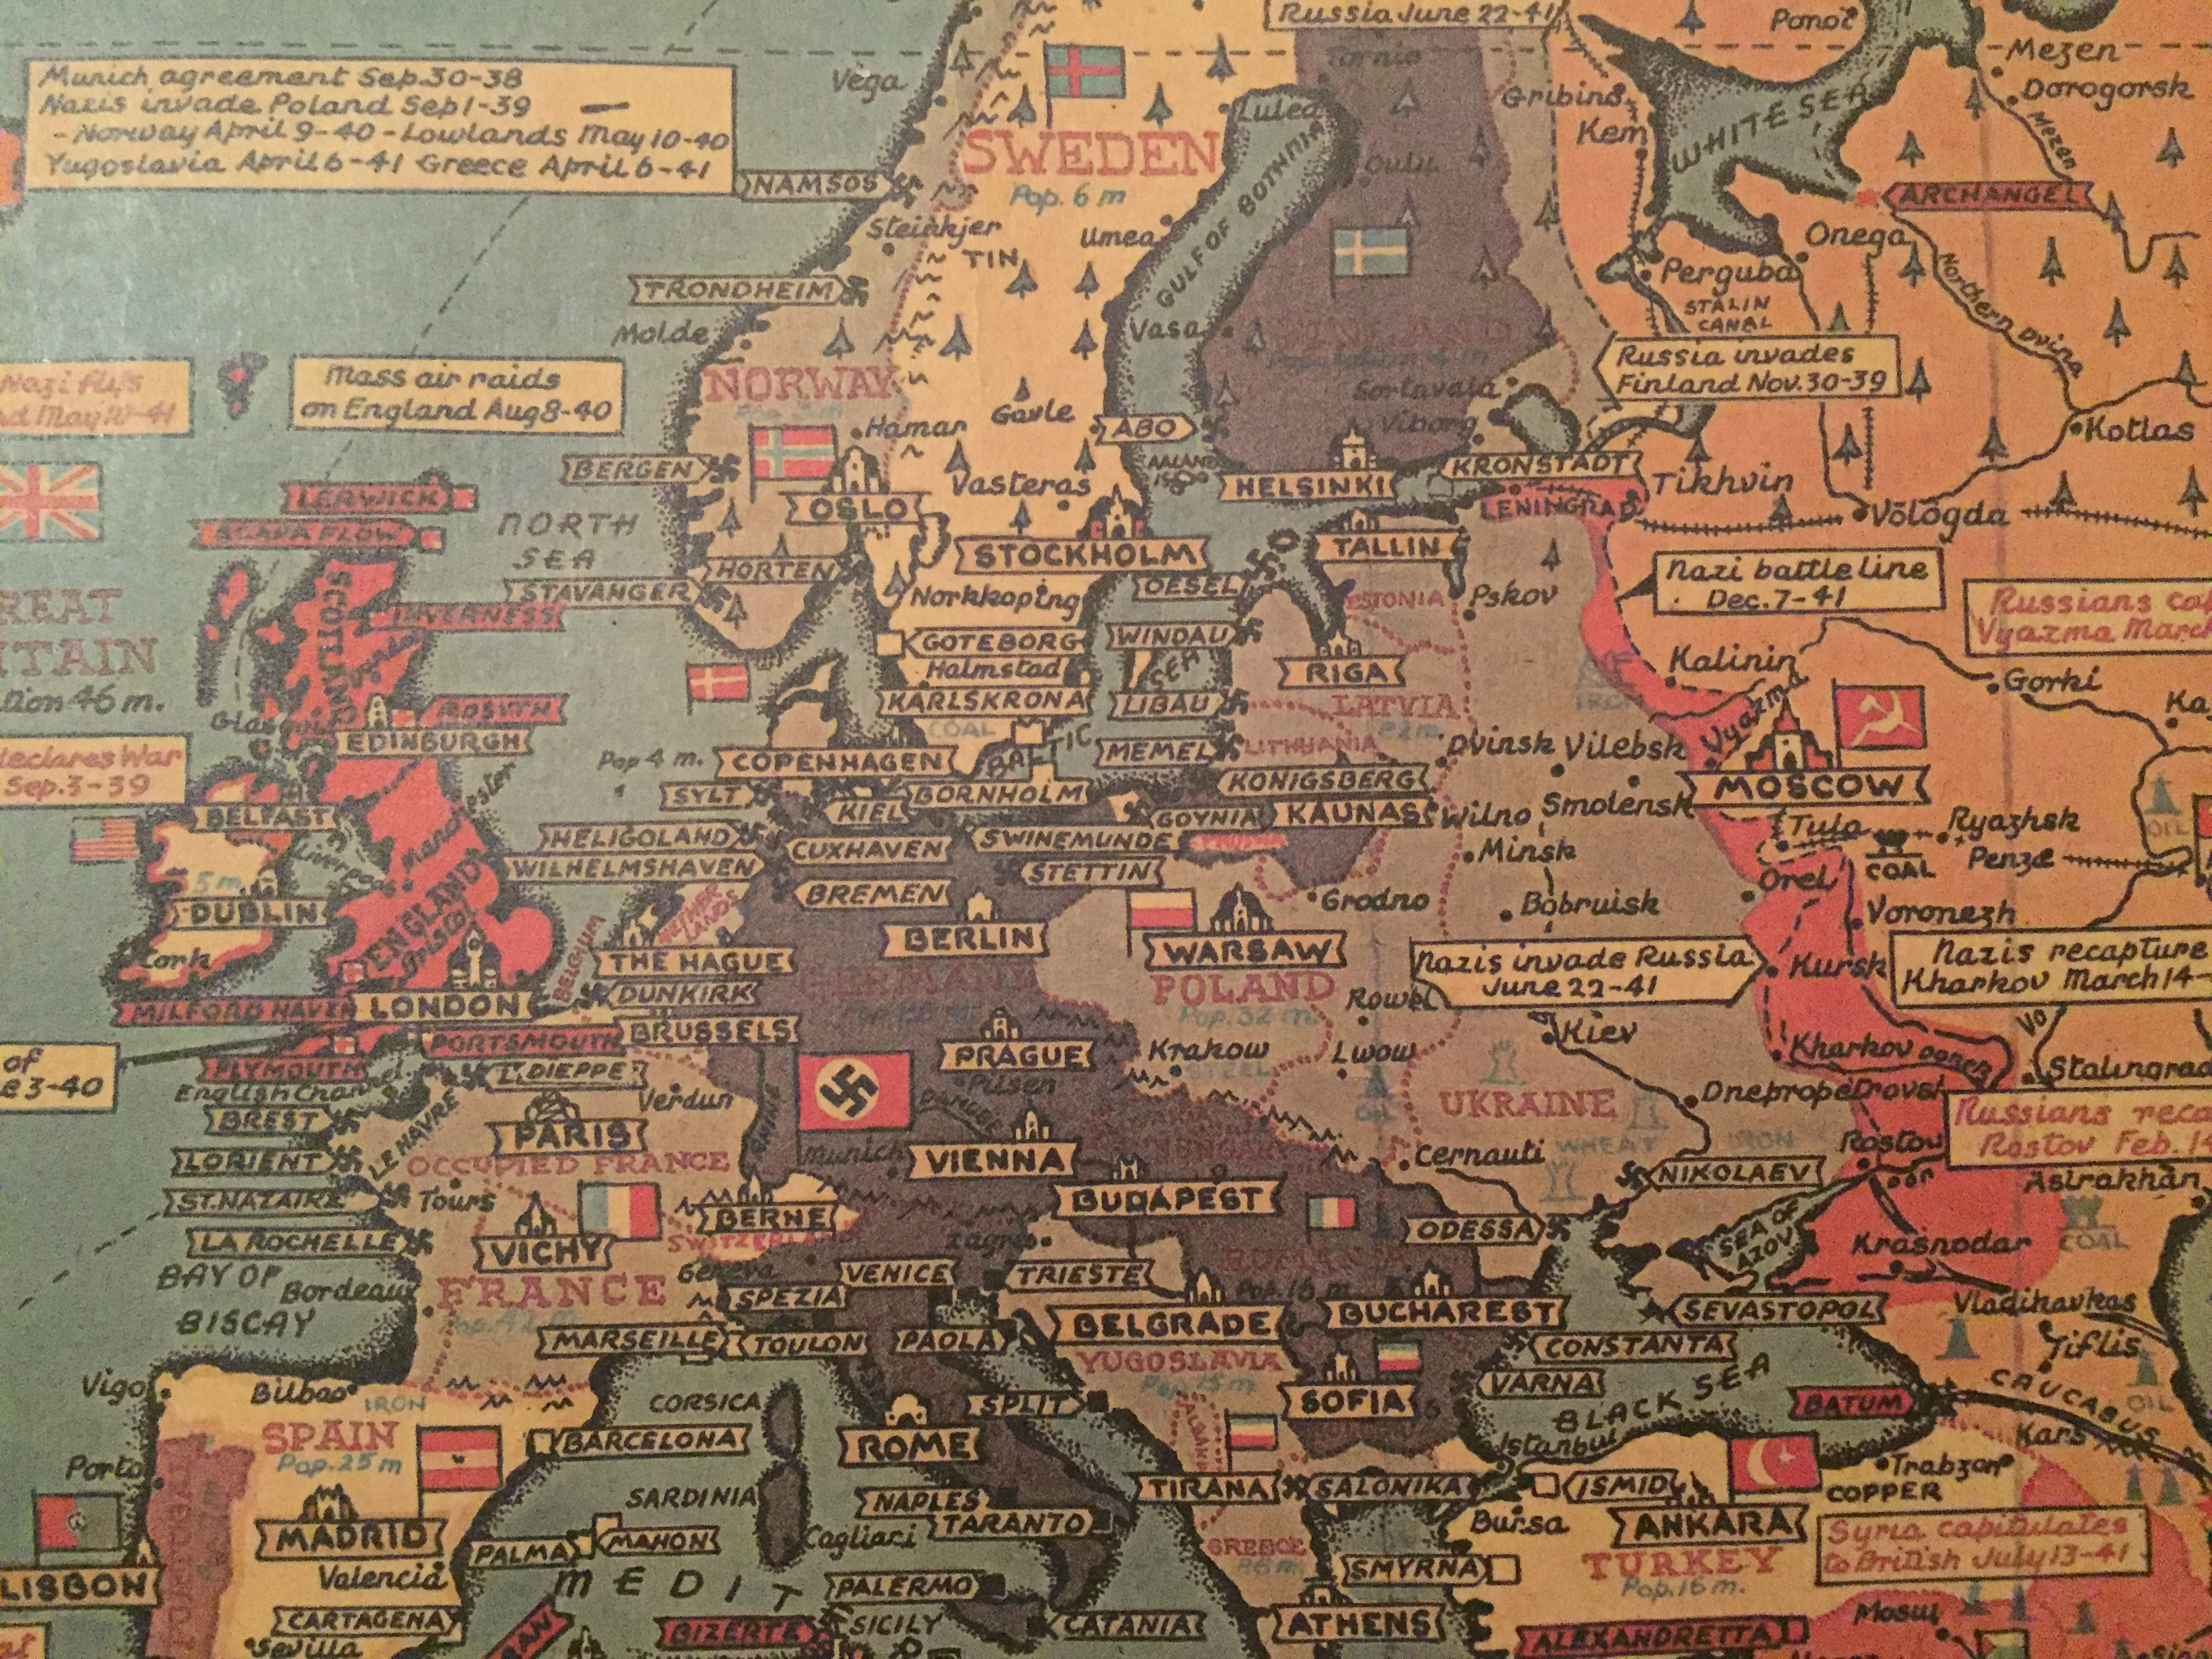 2 verdenskrig kart Kart over andre verdenskrig – Kartmesteren.no 2 verdenskrig kart